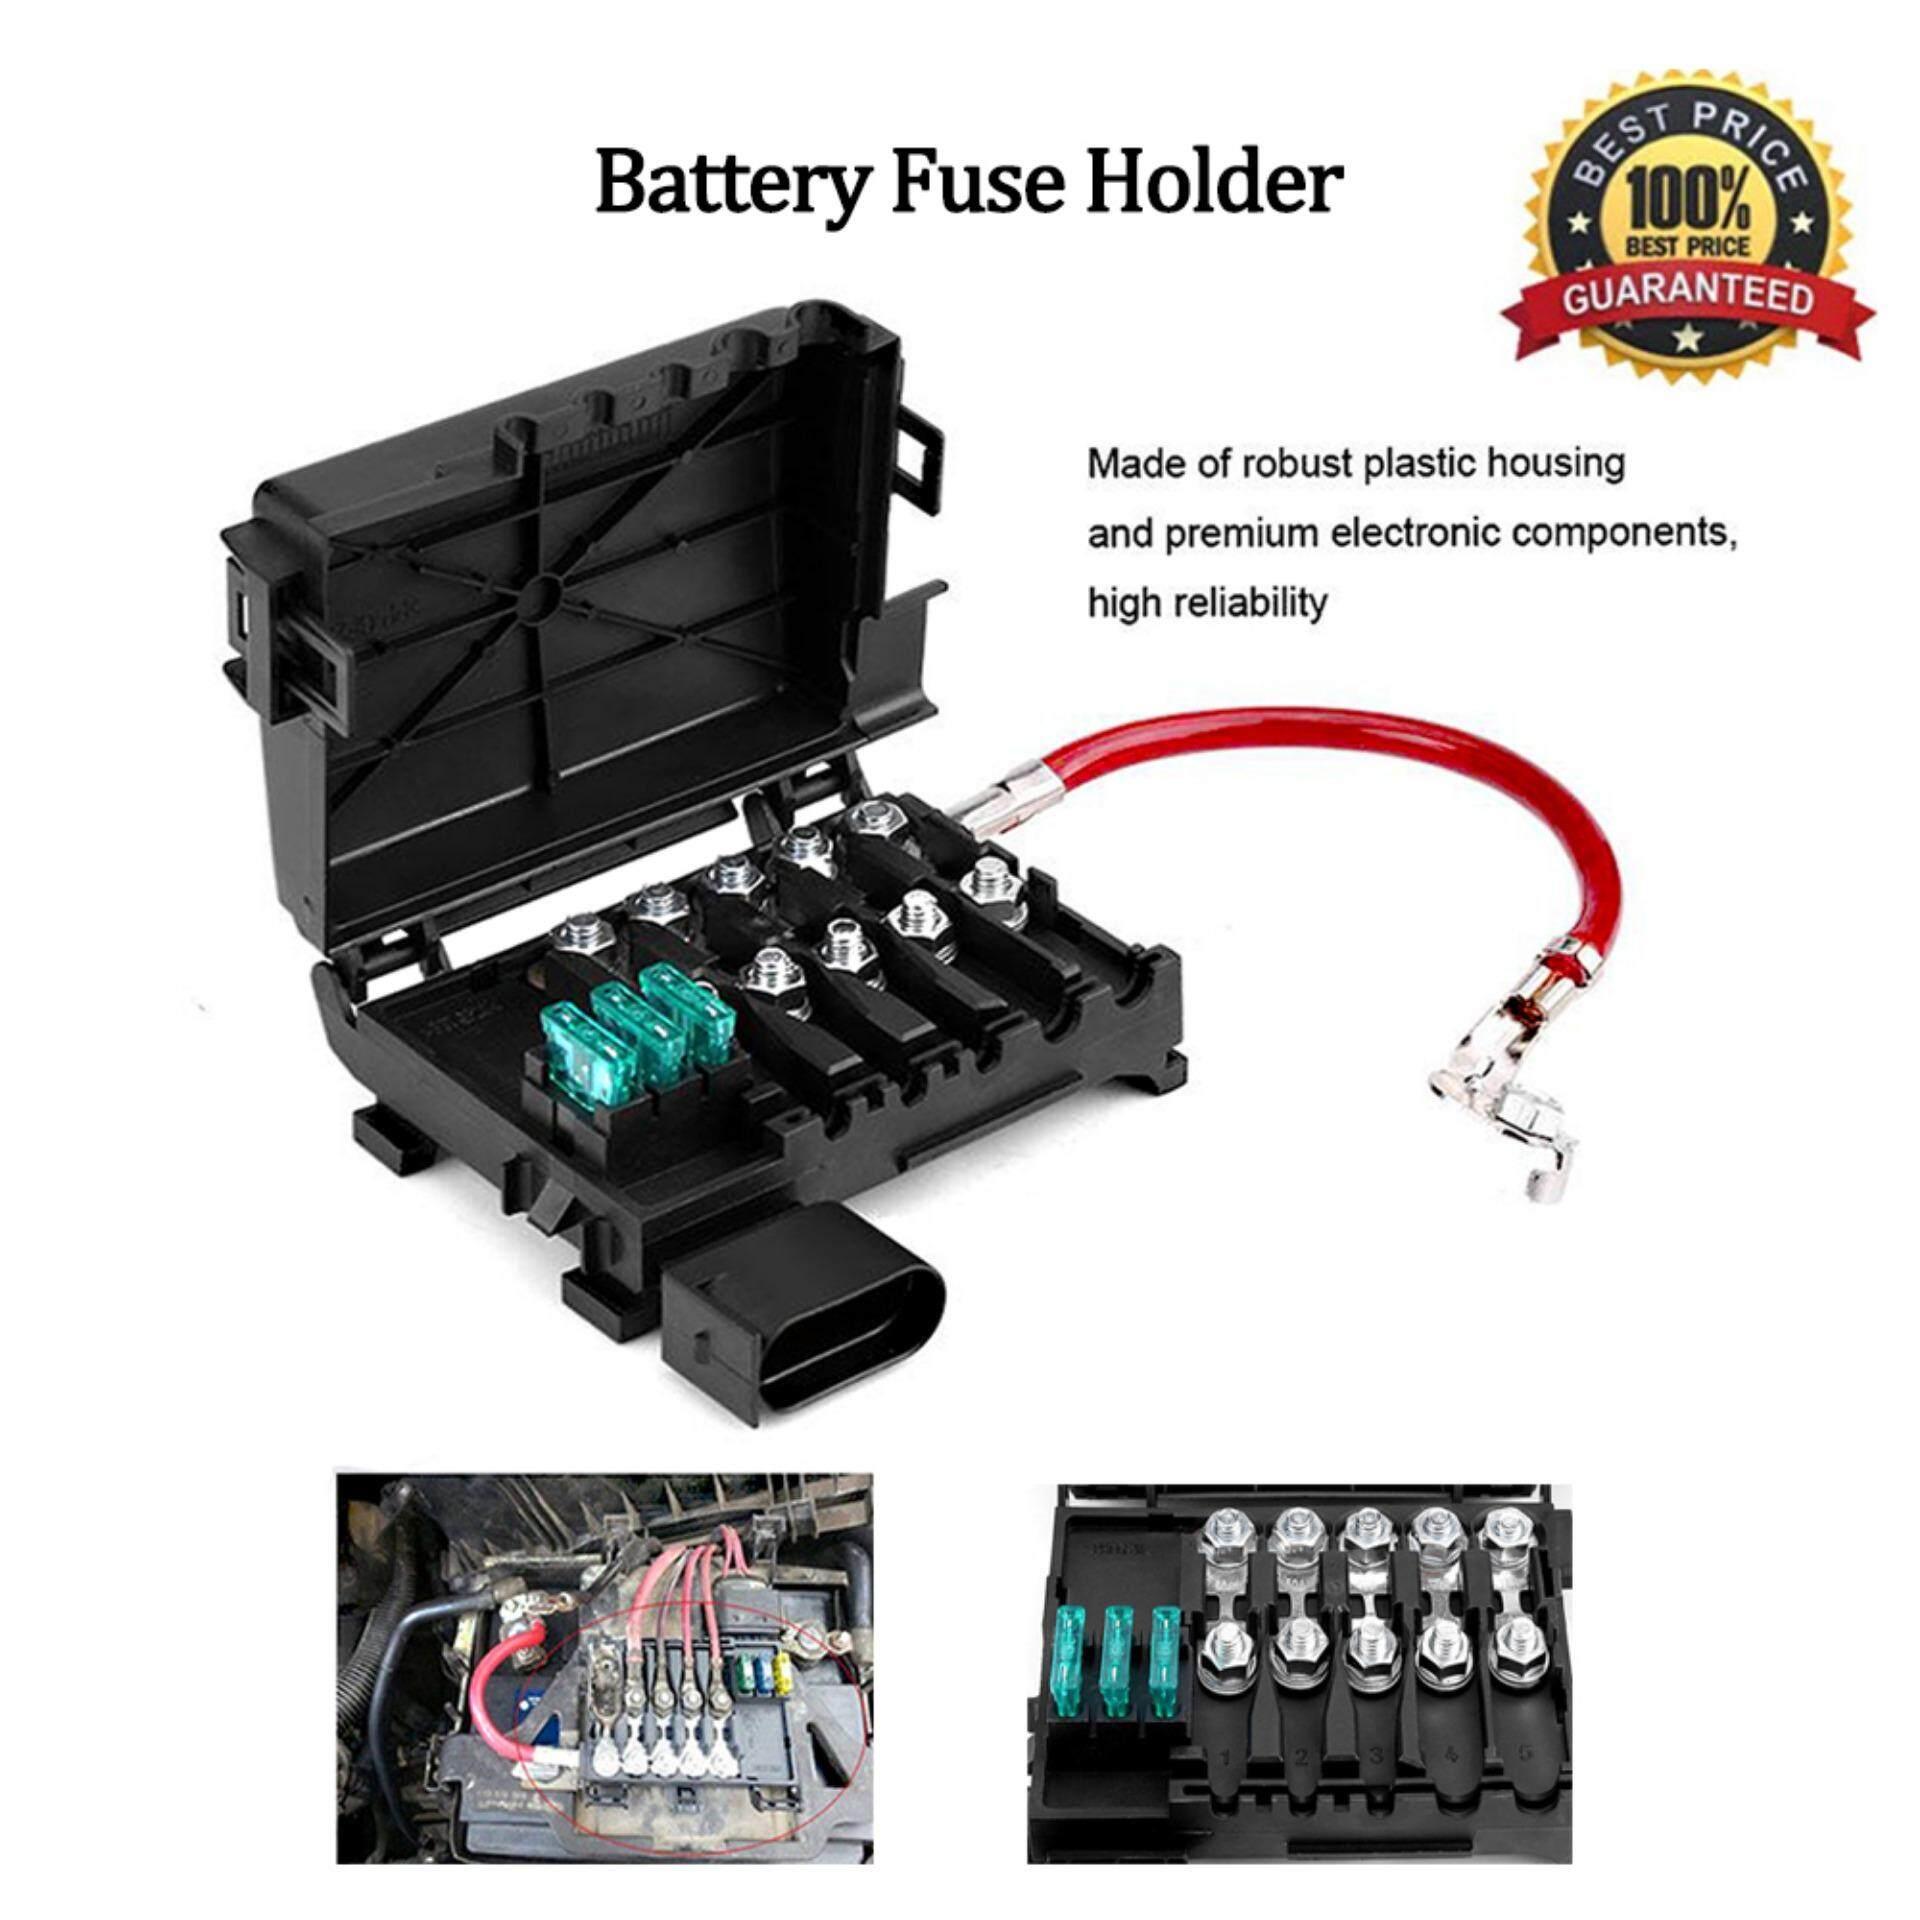 Features Vetomile Fuse Box 10 Way Pc Terminal Cs 579b3 Dan Harga Plastic Battery Car Holder For Vw Jetta Golf